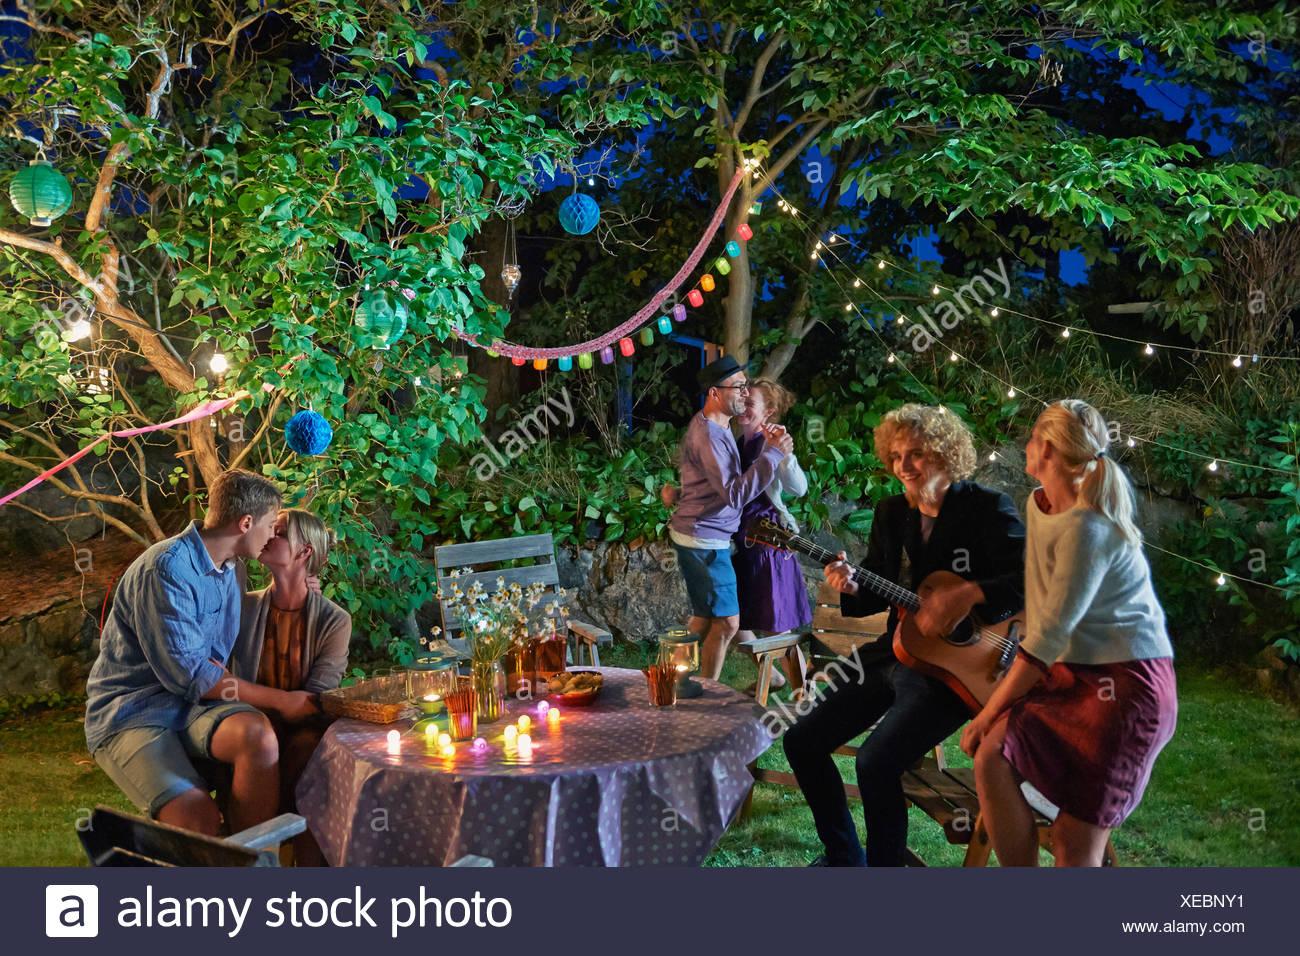 Trois couples having fun at garden party at night Photo Stock